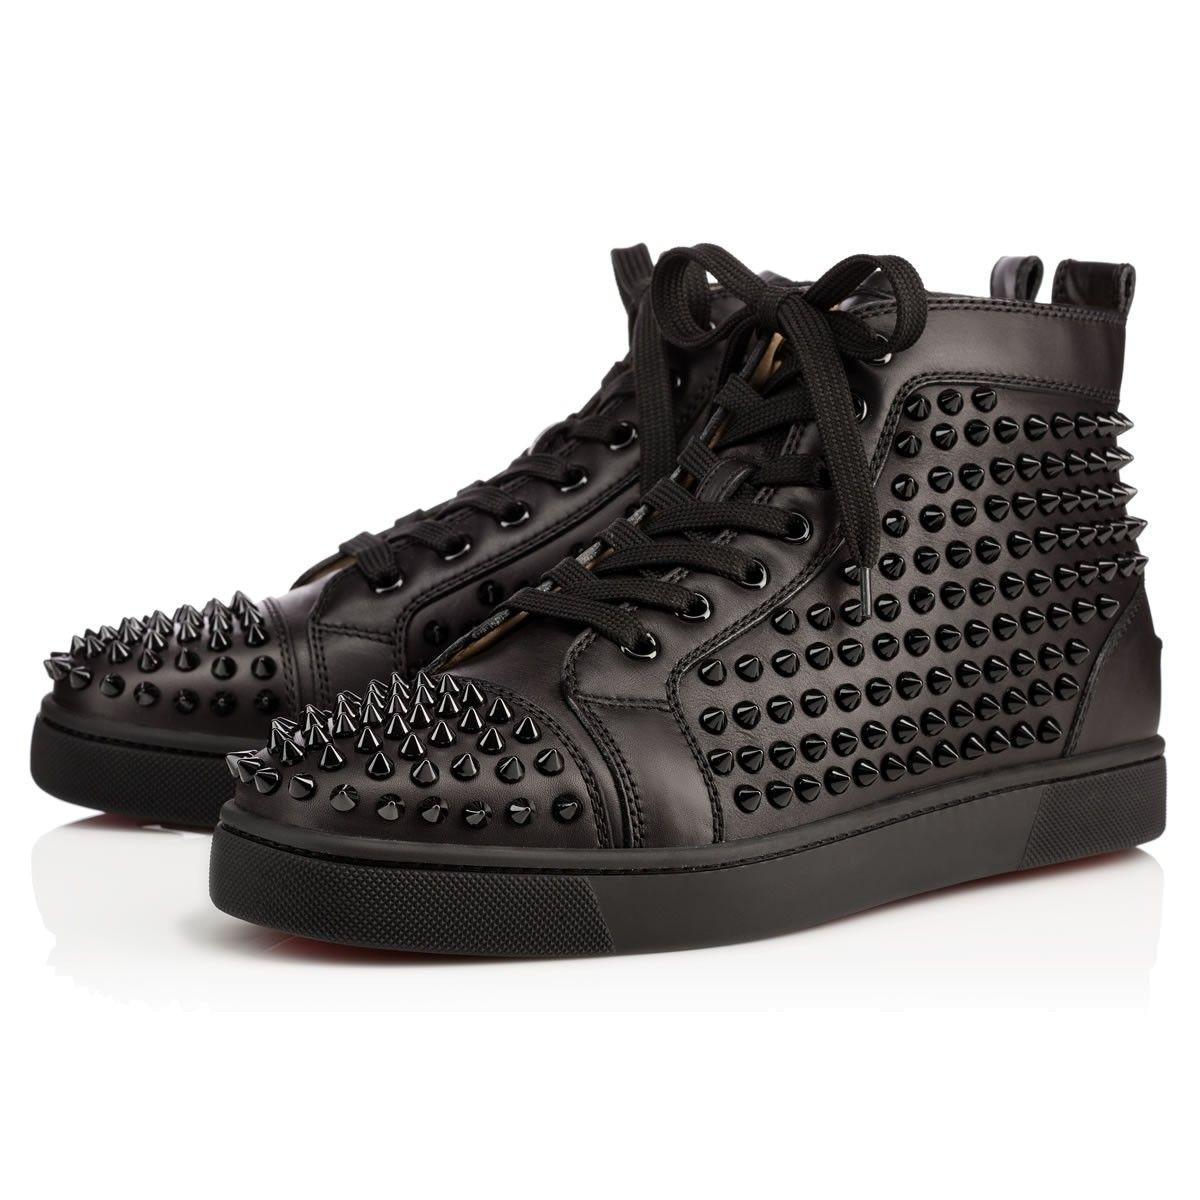 Louis Spikes Men's Flat Black/Black/Bk Leather - Men Shoes - Christian  Louboutin